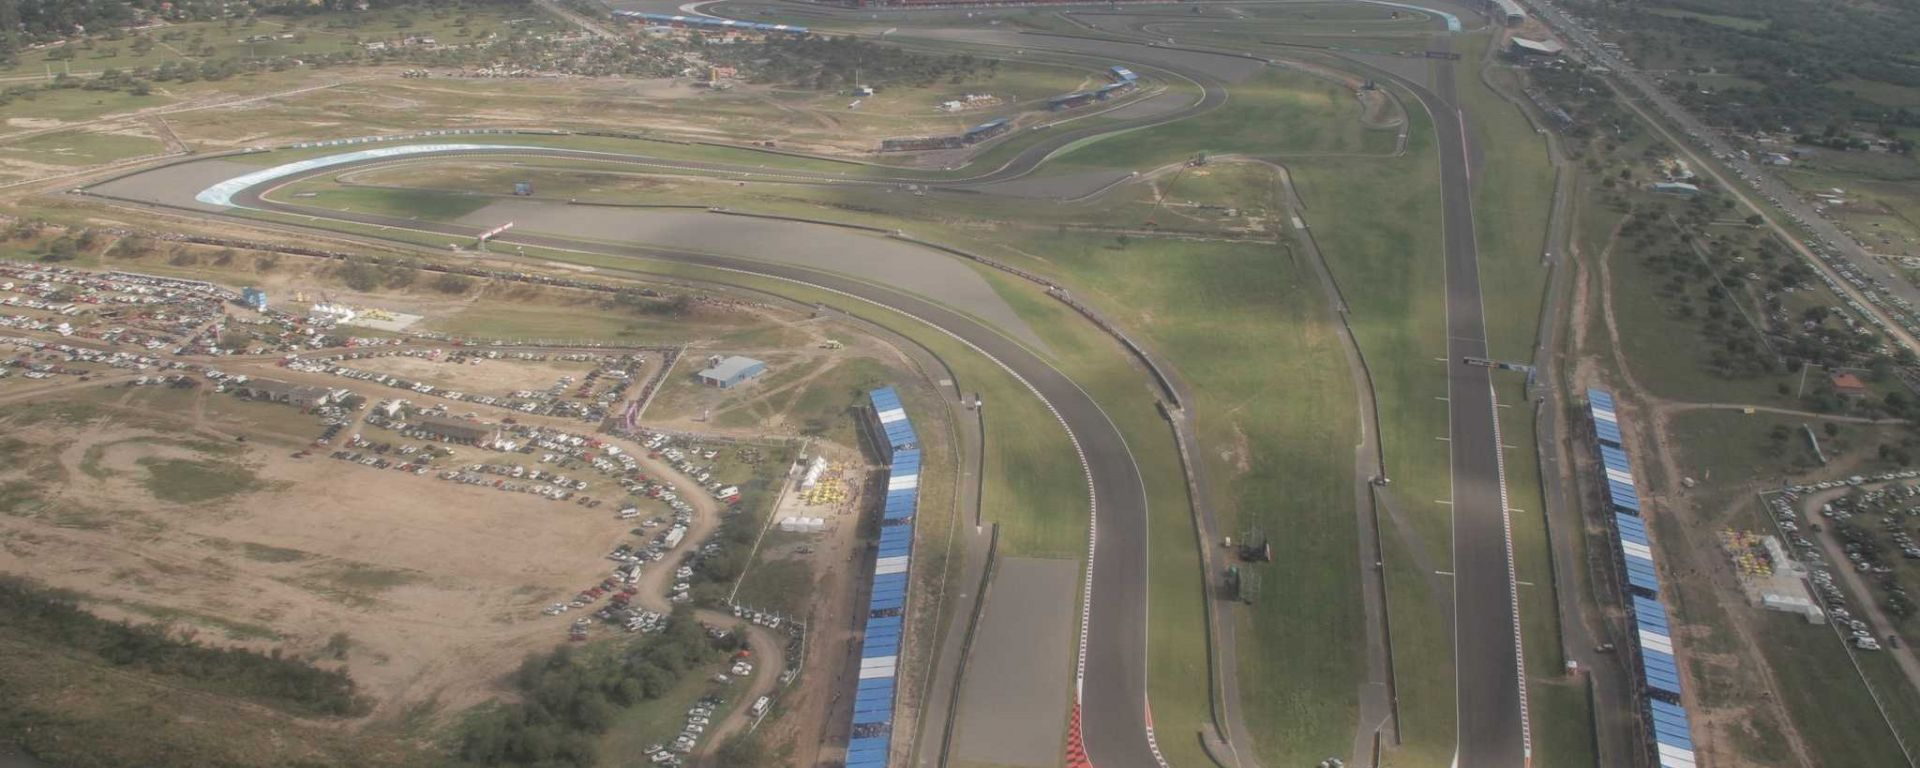 MotoGP Argentina: Prove libere, qualifiche, risultati gara